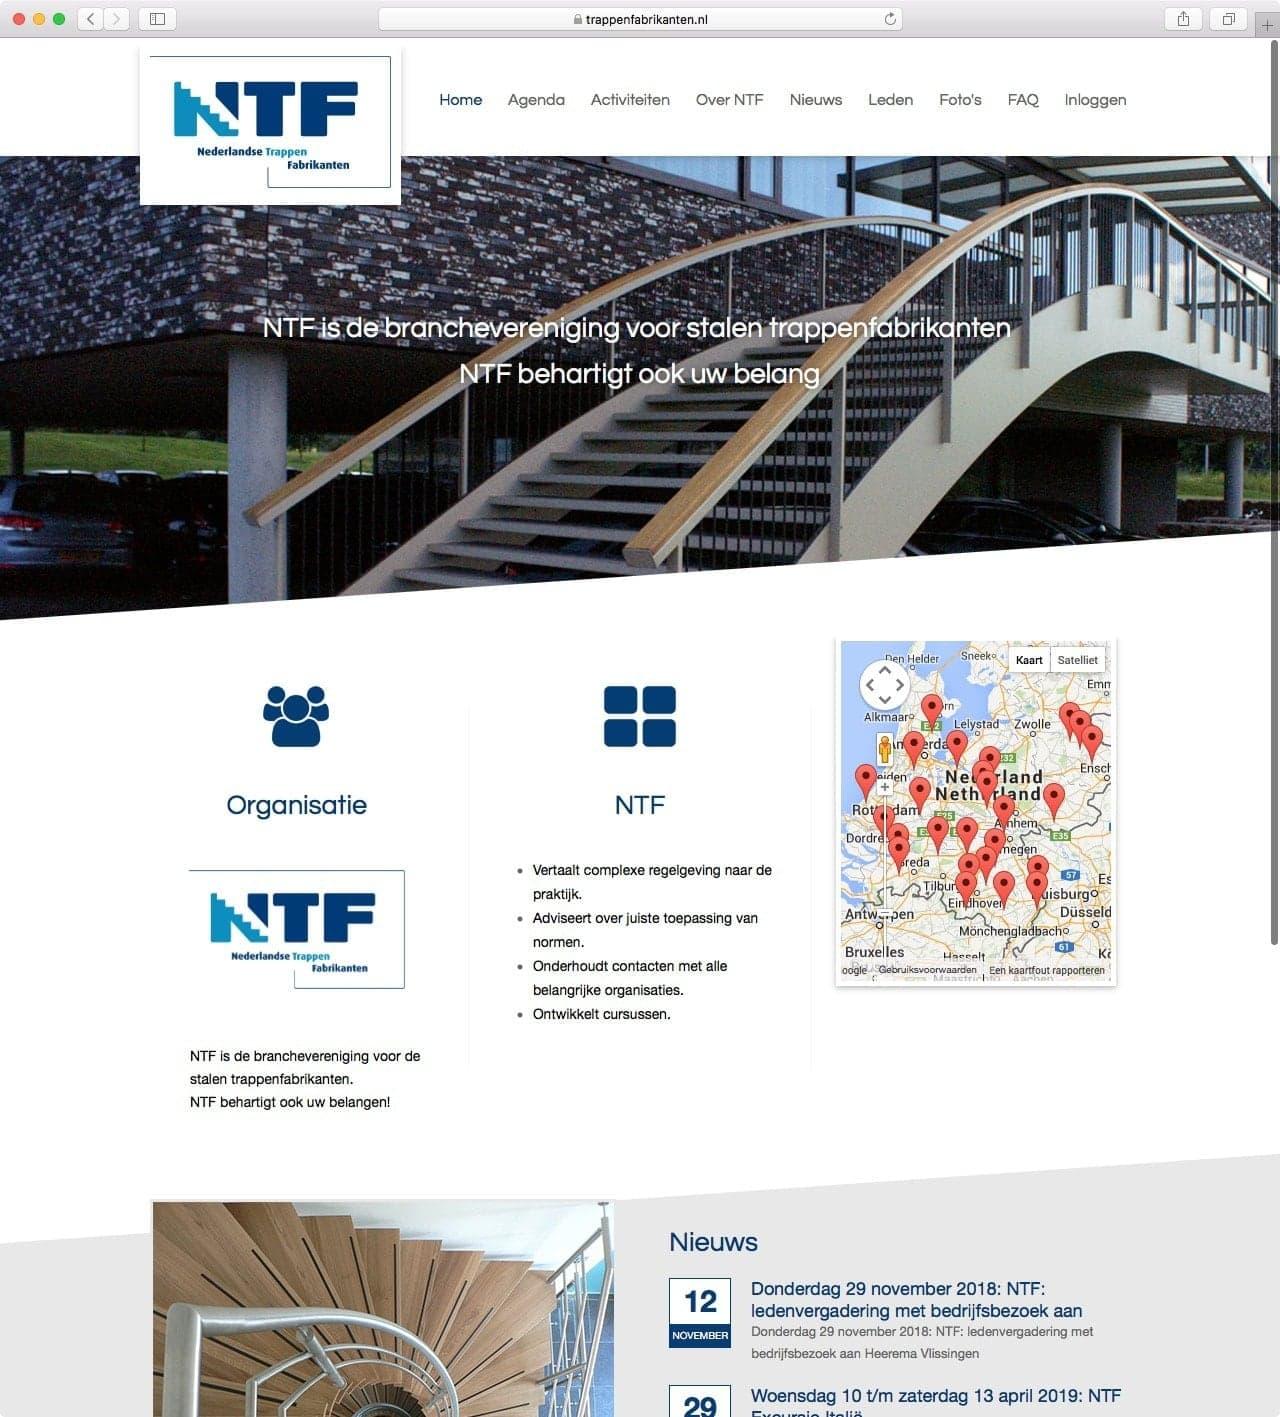 Nederlandse trappen fabrikanten